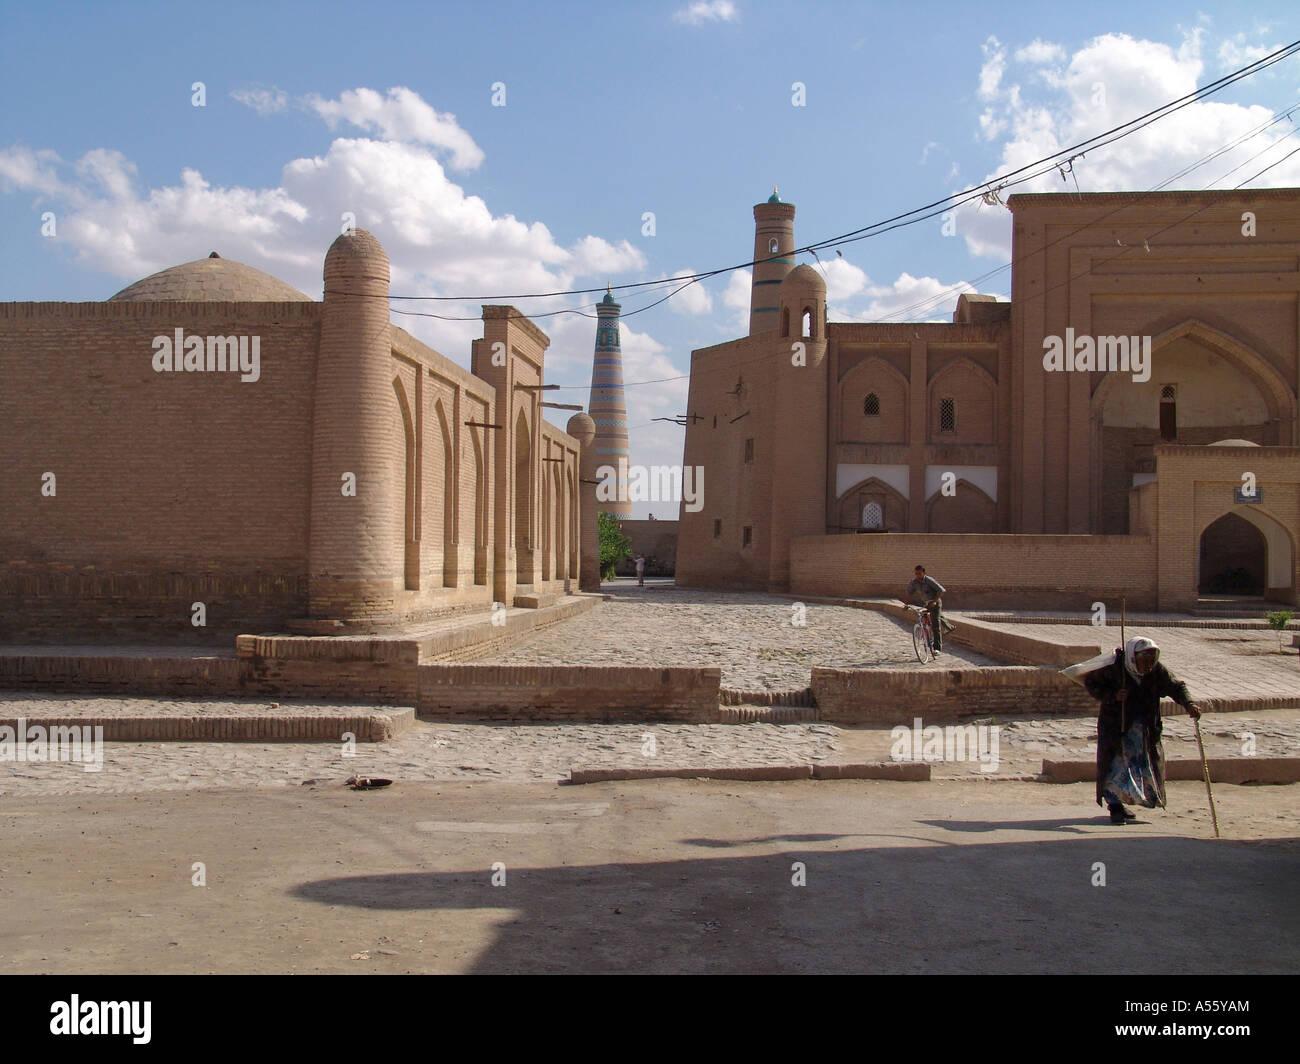 Painet iw2396 in Zentralasien Sowjetunion Bilder Islam moslem Seiden Straße Usbekistan Chiwa Land sich entwickelnde Stockbild